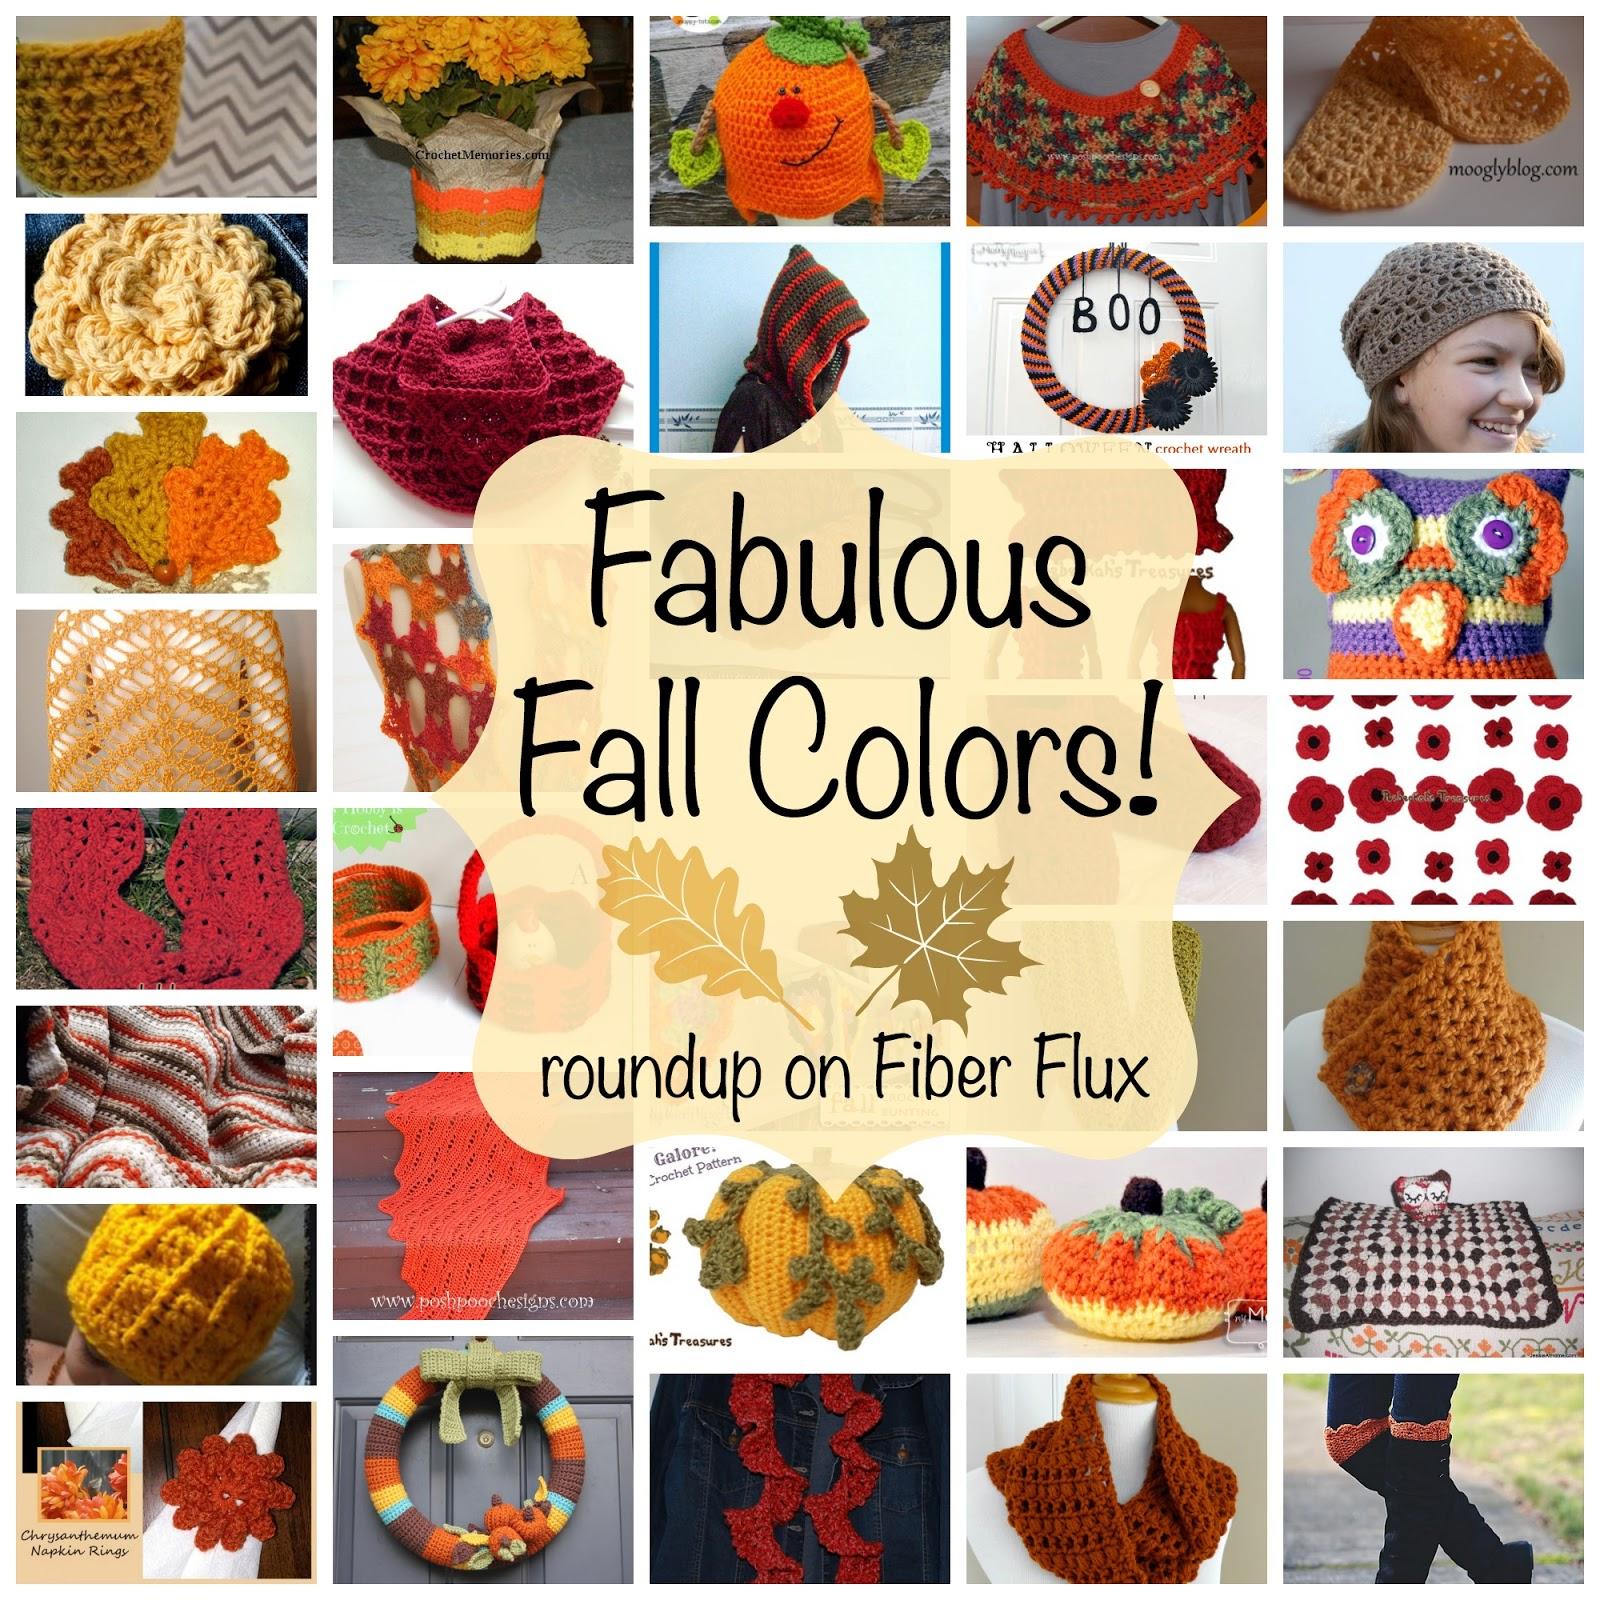 Fiber Flux: Fabulous Fall Color! Over 30 Free Crochet Patterns...